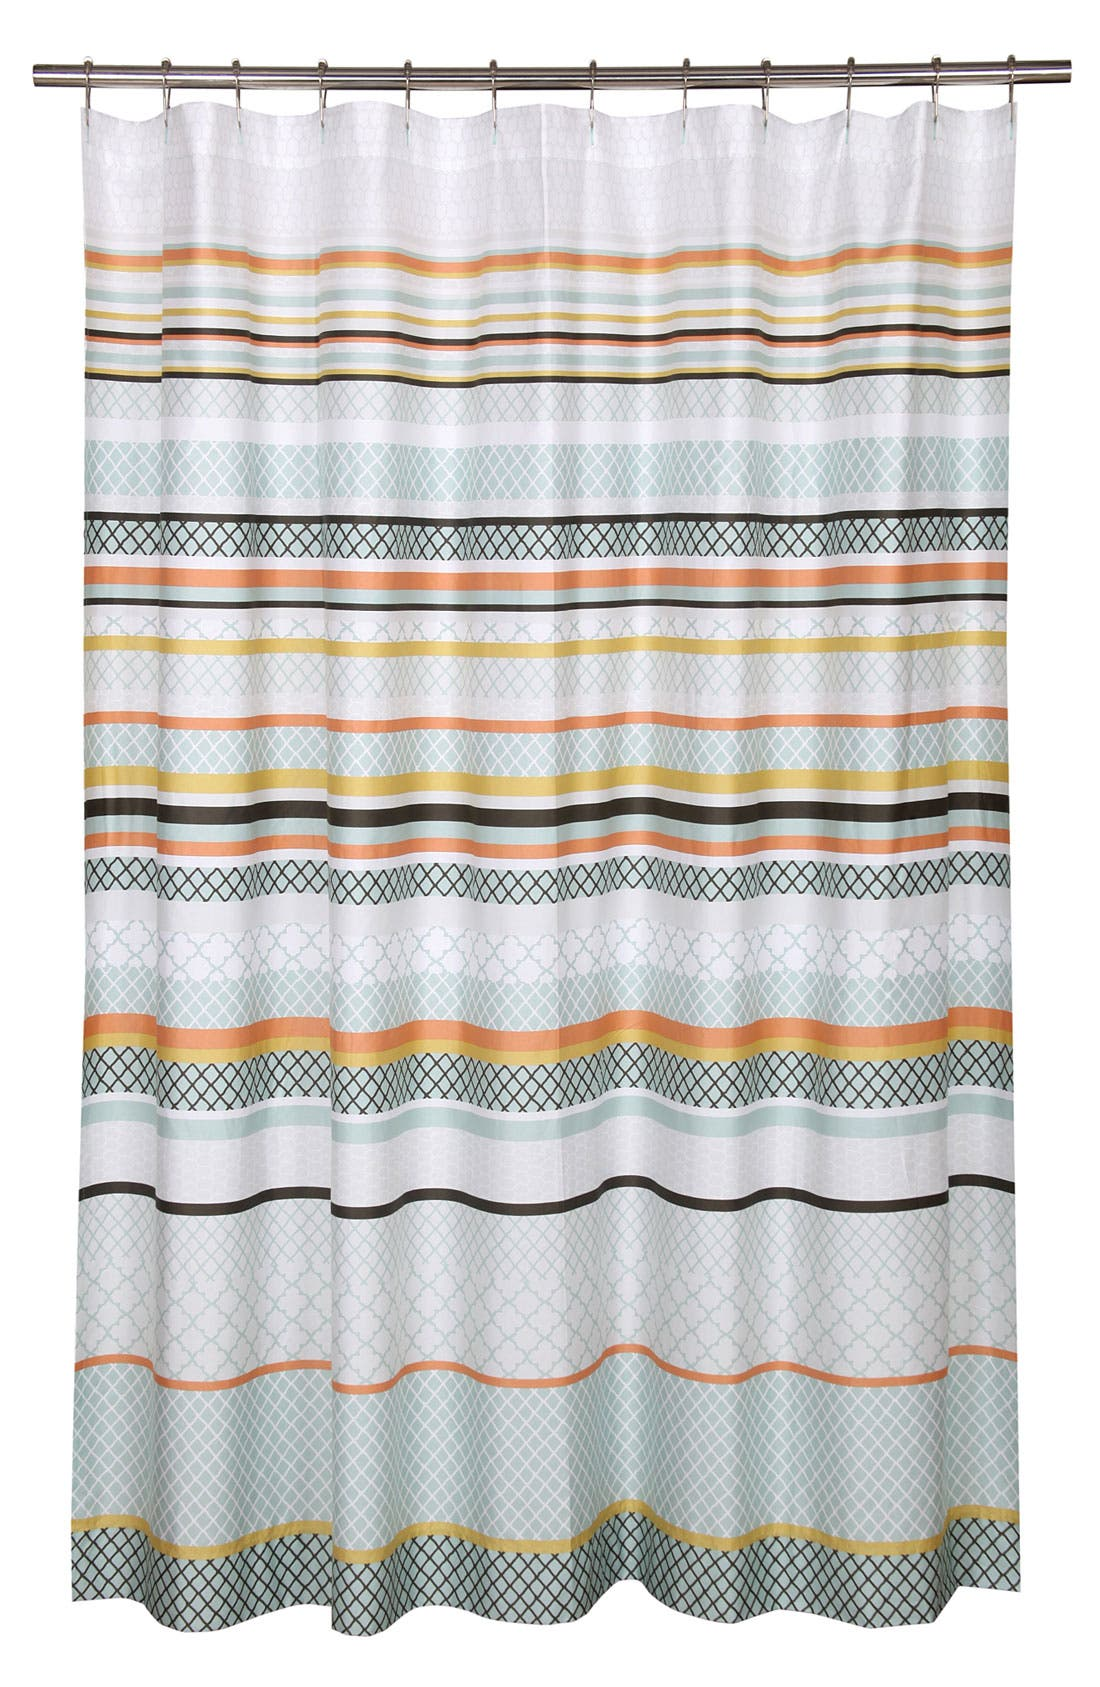 Main Image - Blissliving Home 'Recoleta' Shower Curtain